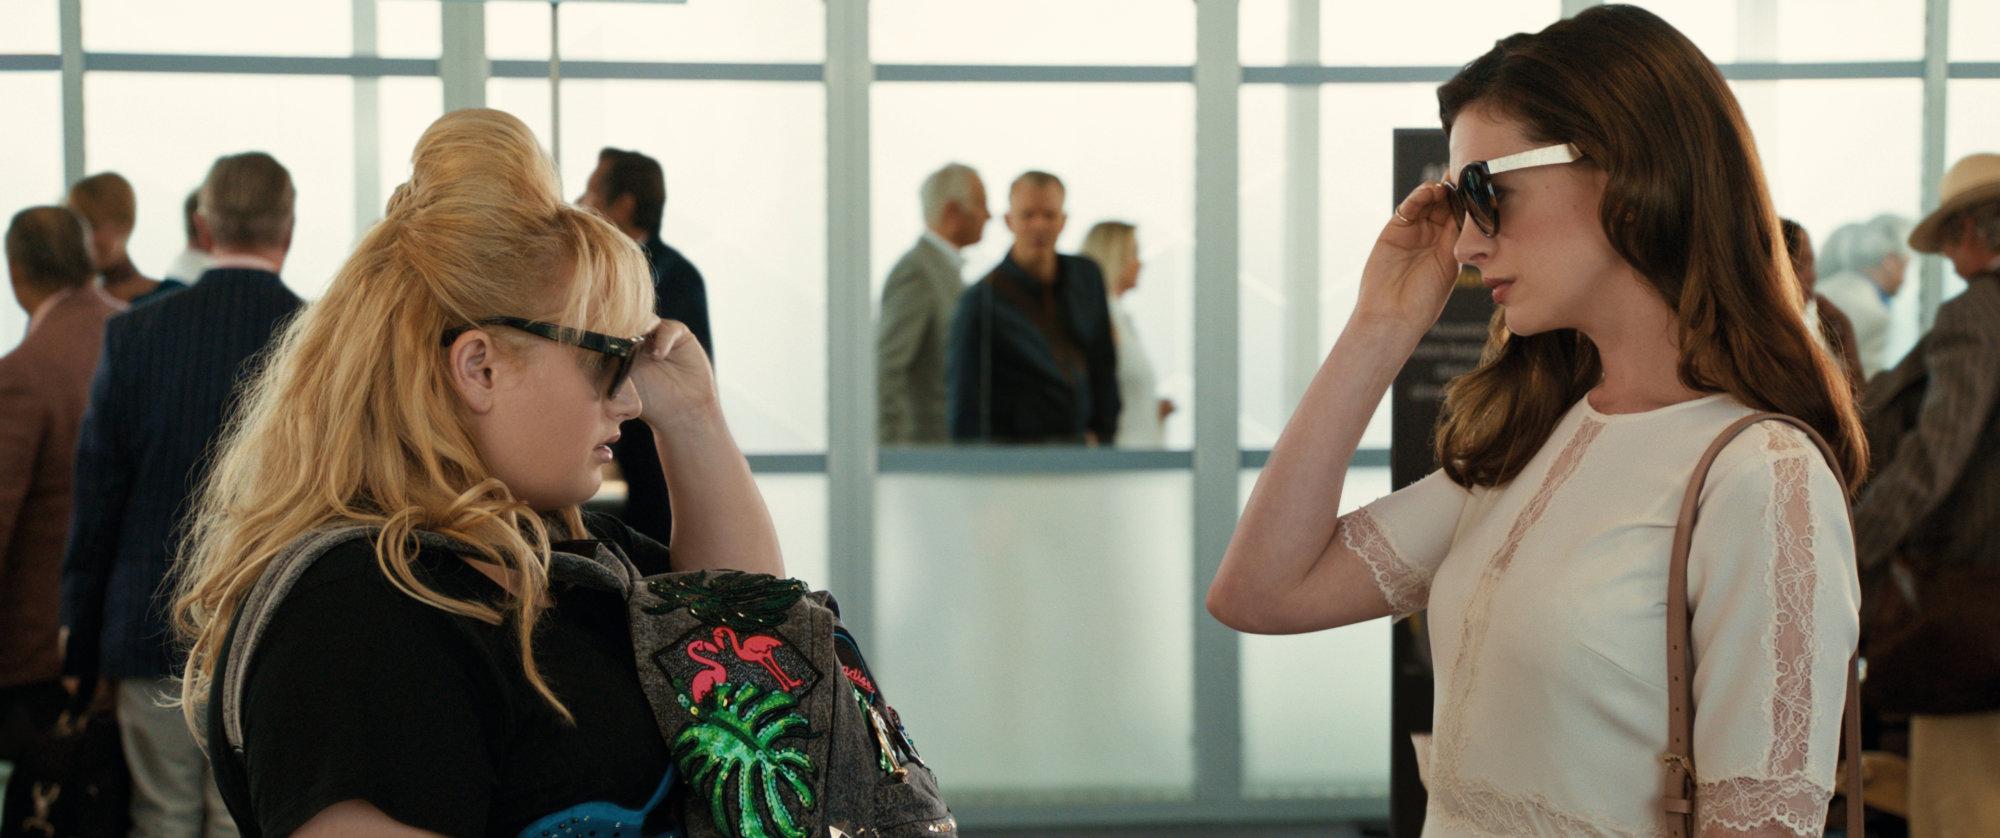 Film Oszustki i ubrania Anne Hatahaway i Rebel Wilson